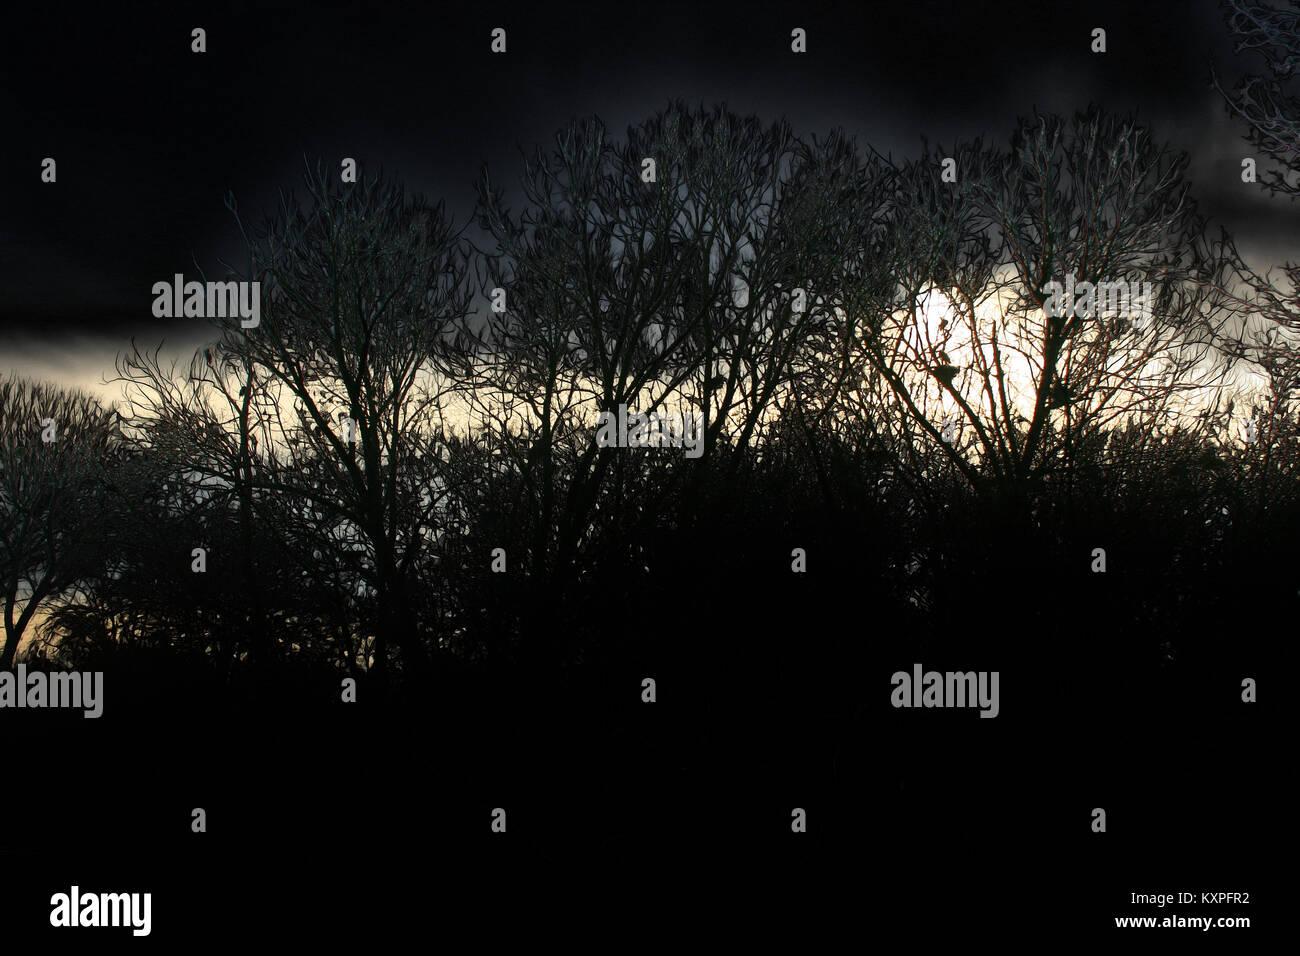 Baumlandschaft - Stock Image